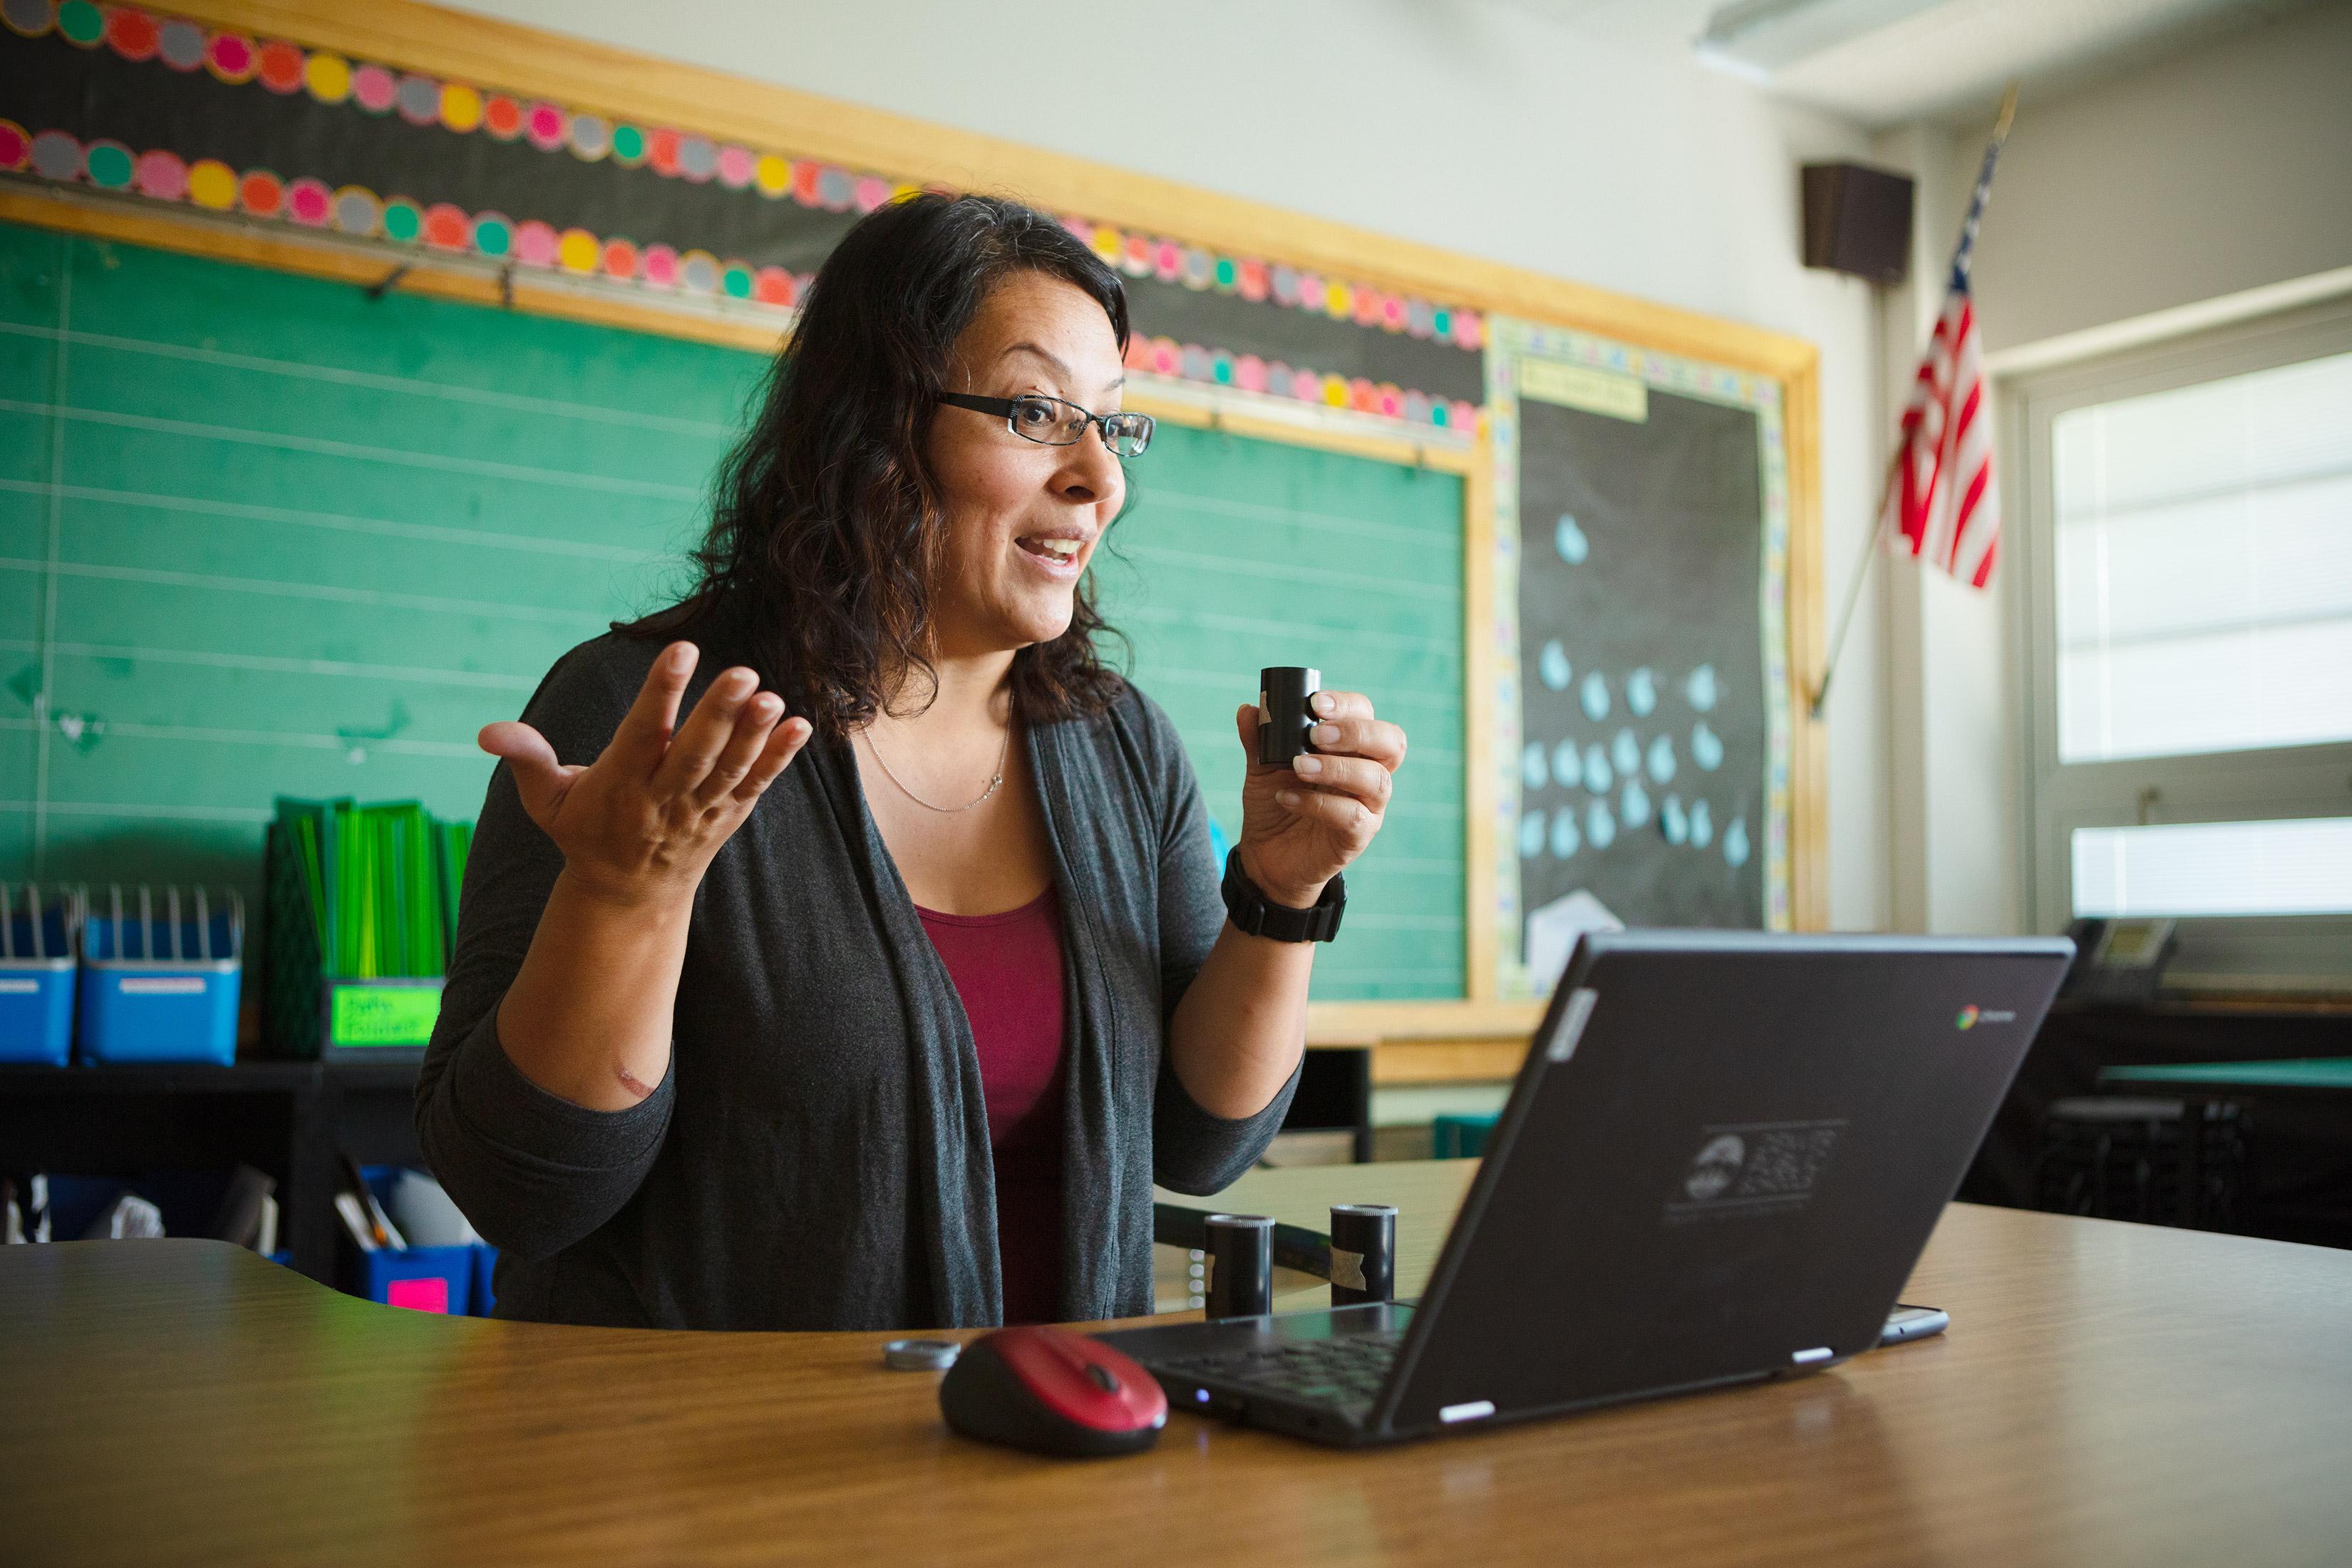 A denver teacher creates videos for virtual students during covid